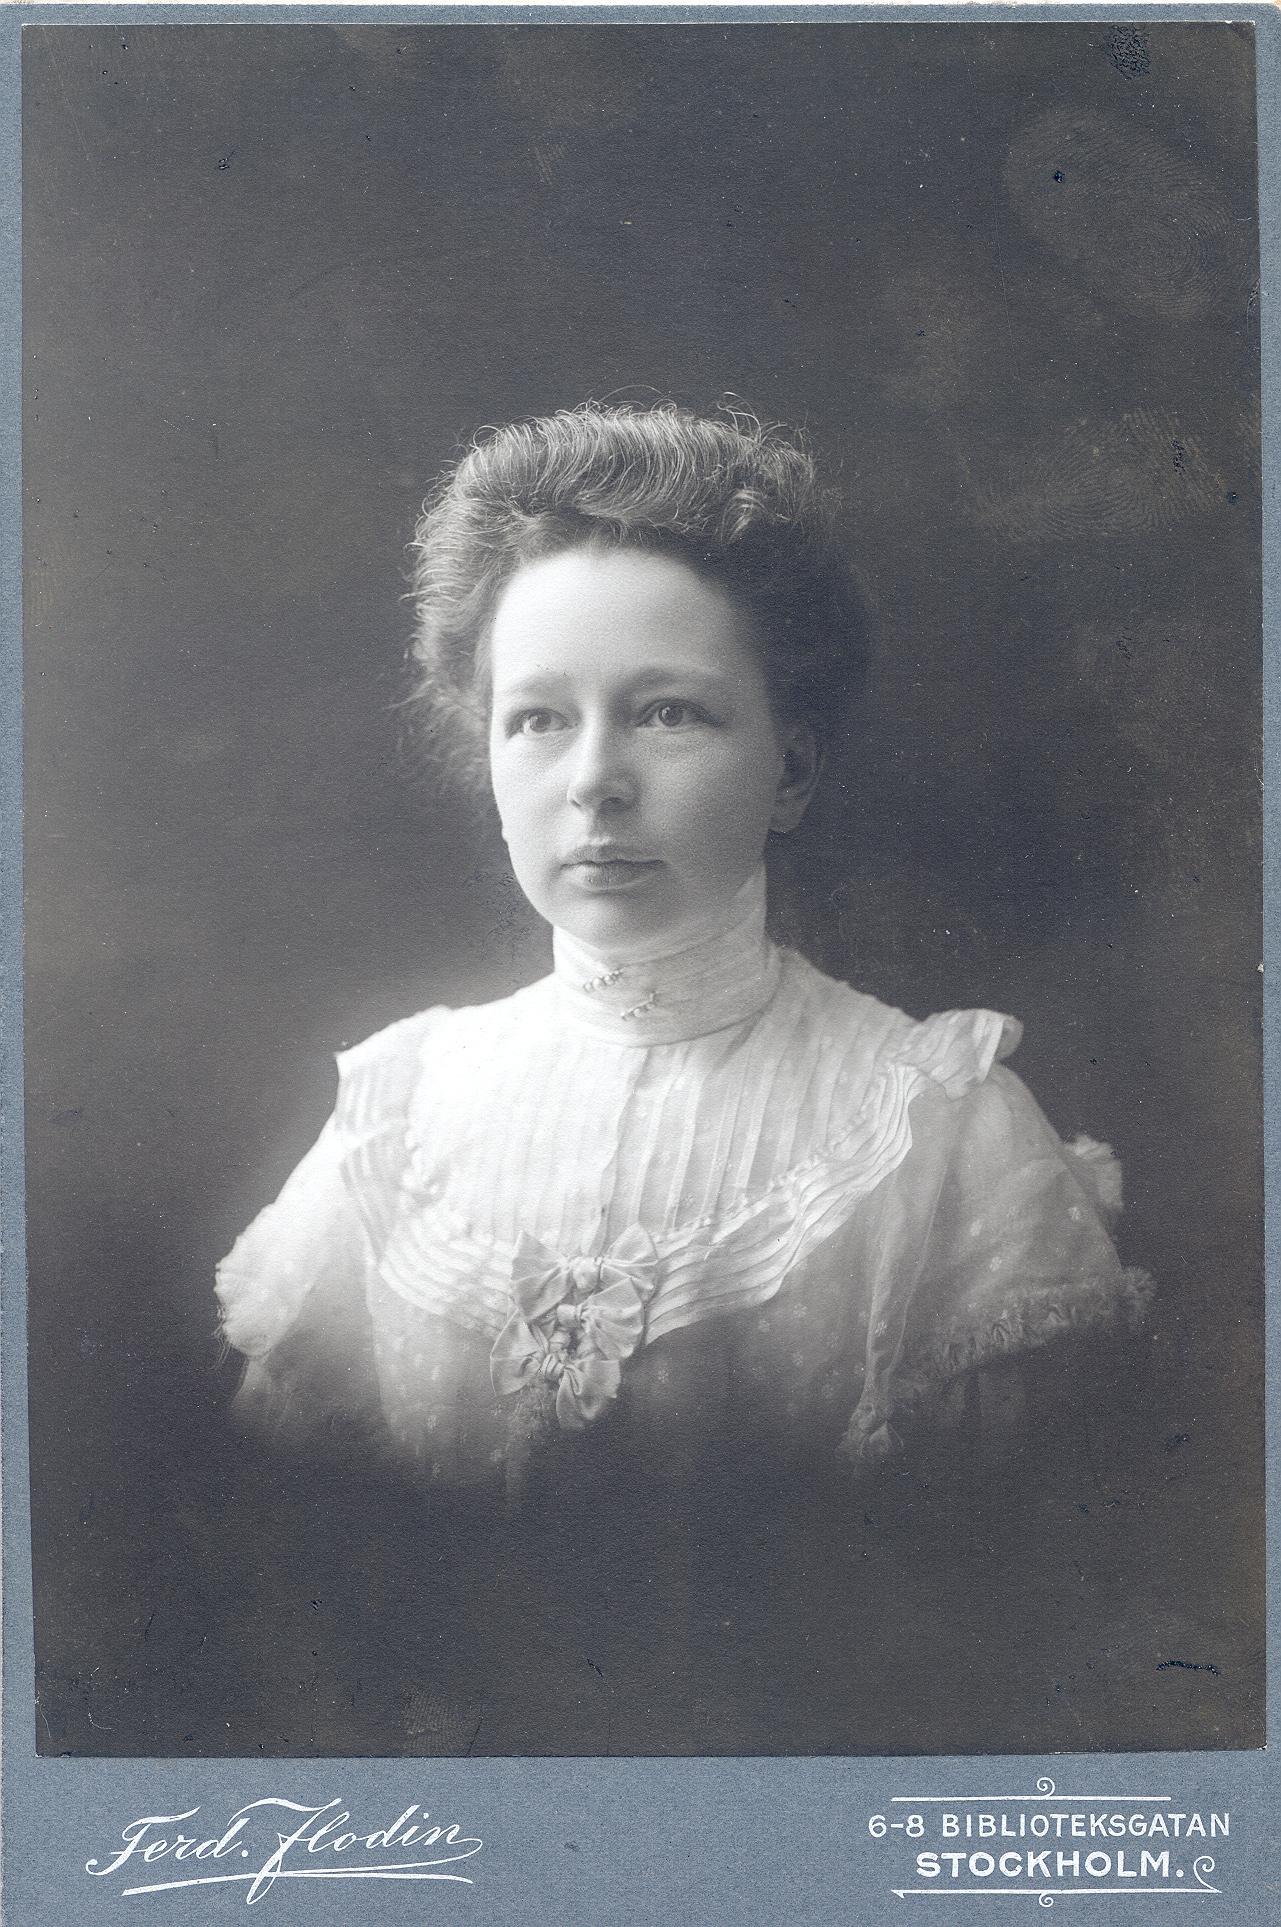 Elisabeth Tamm (KvinnSam, Göteborgs universitetsbibliotek)